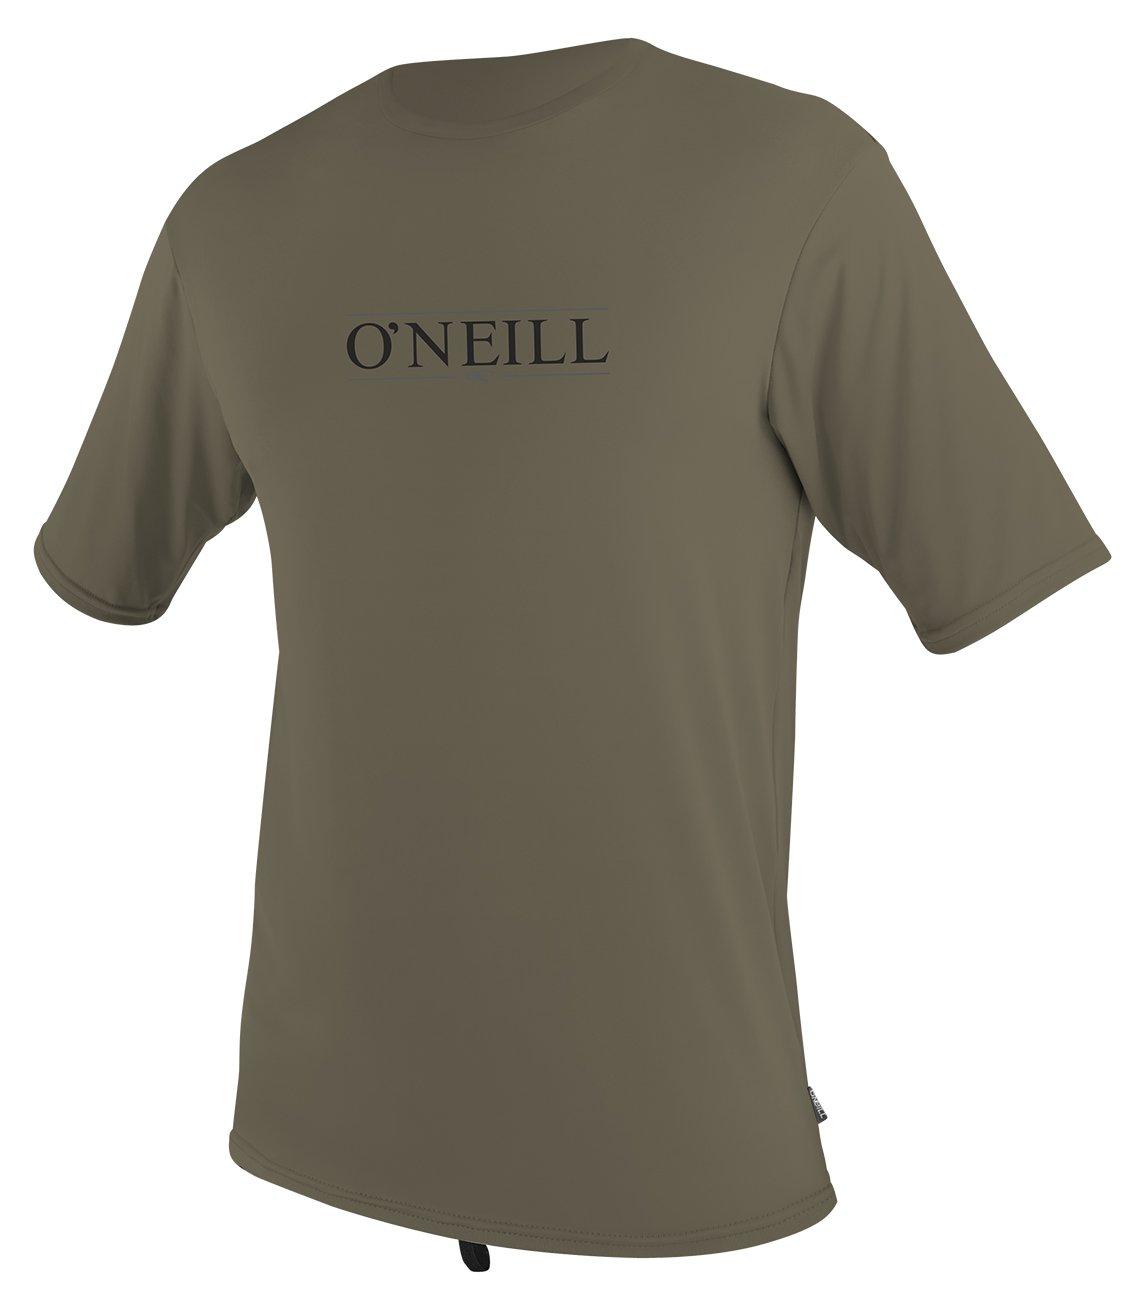 O'Neill Men's Premium Short Sleeve Rash Tee, Khaki - LG, Khaki Premium, Large